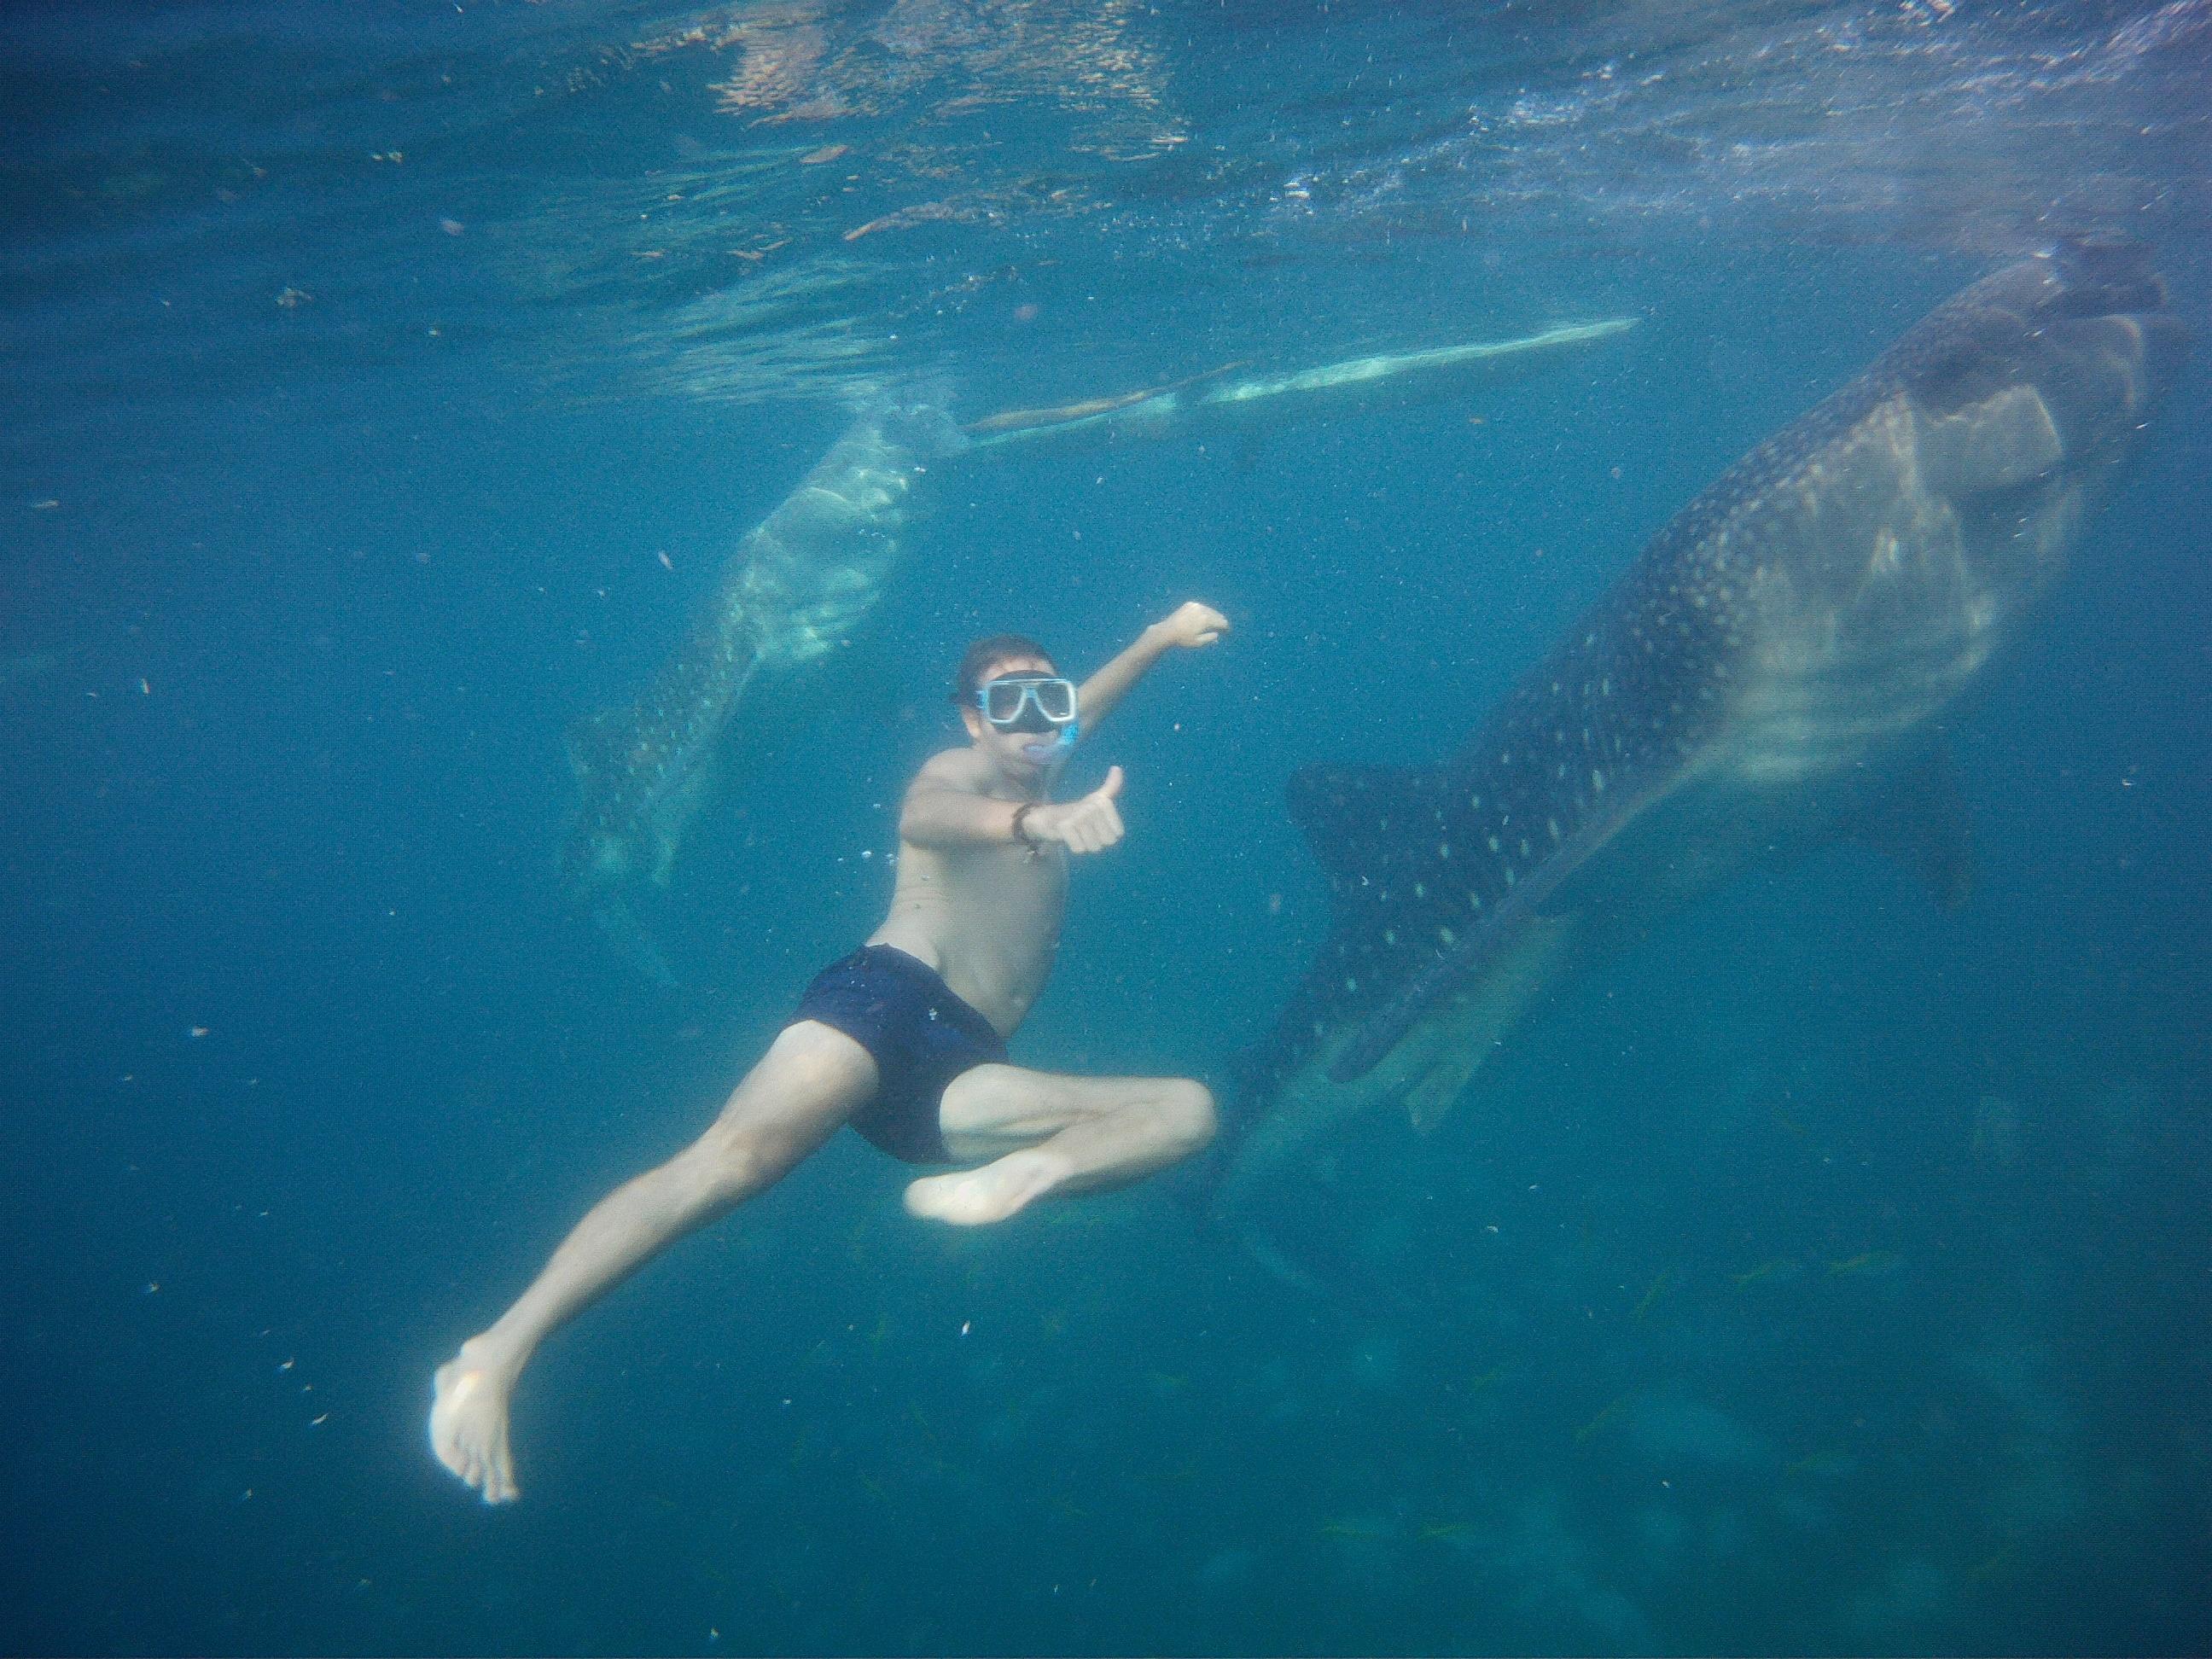 whale sharks, oslob whale sharks, whale sharks oslob, swimming with whale sharks, swimming with whale sharks cebu, whale sharks philippines, whale sharks cebu, whale sharks in oslob, best place to swim with whale sharks in the philippines